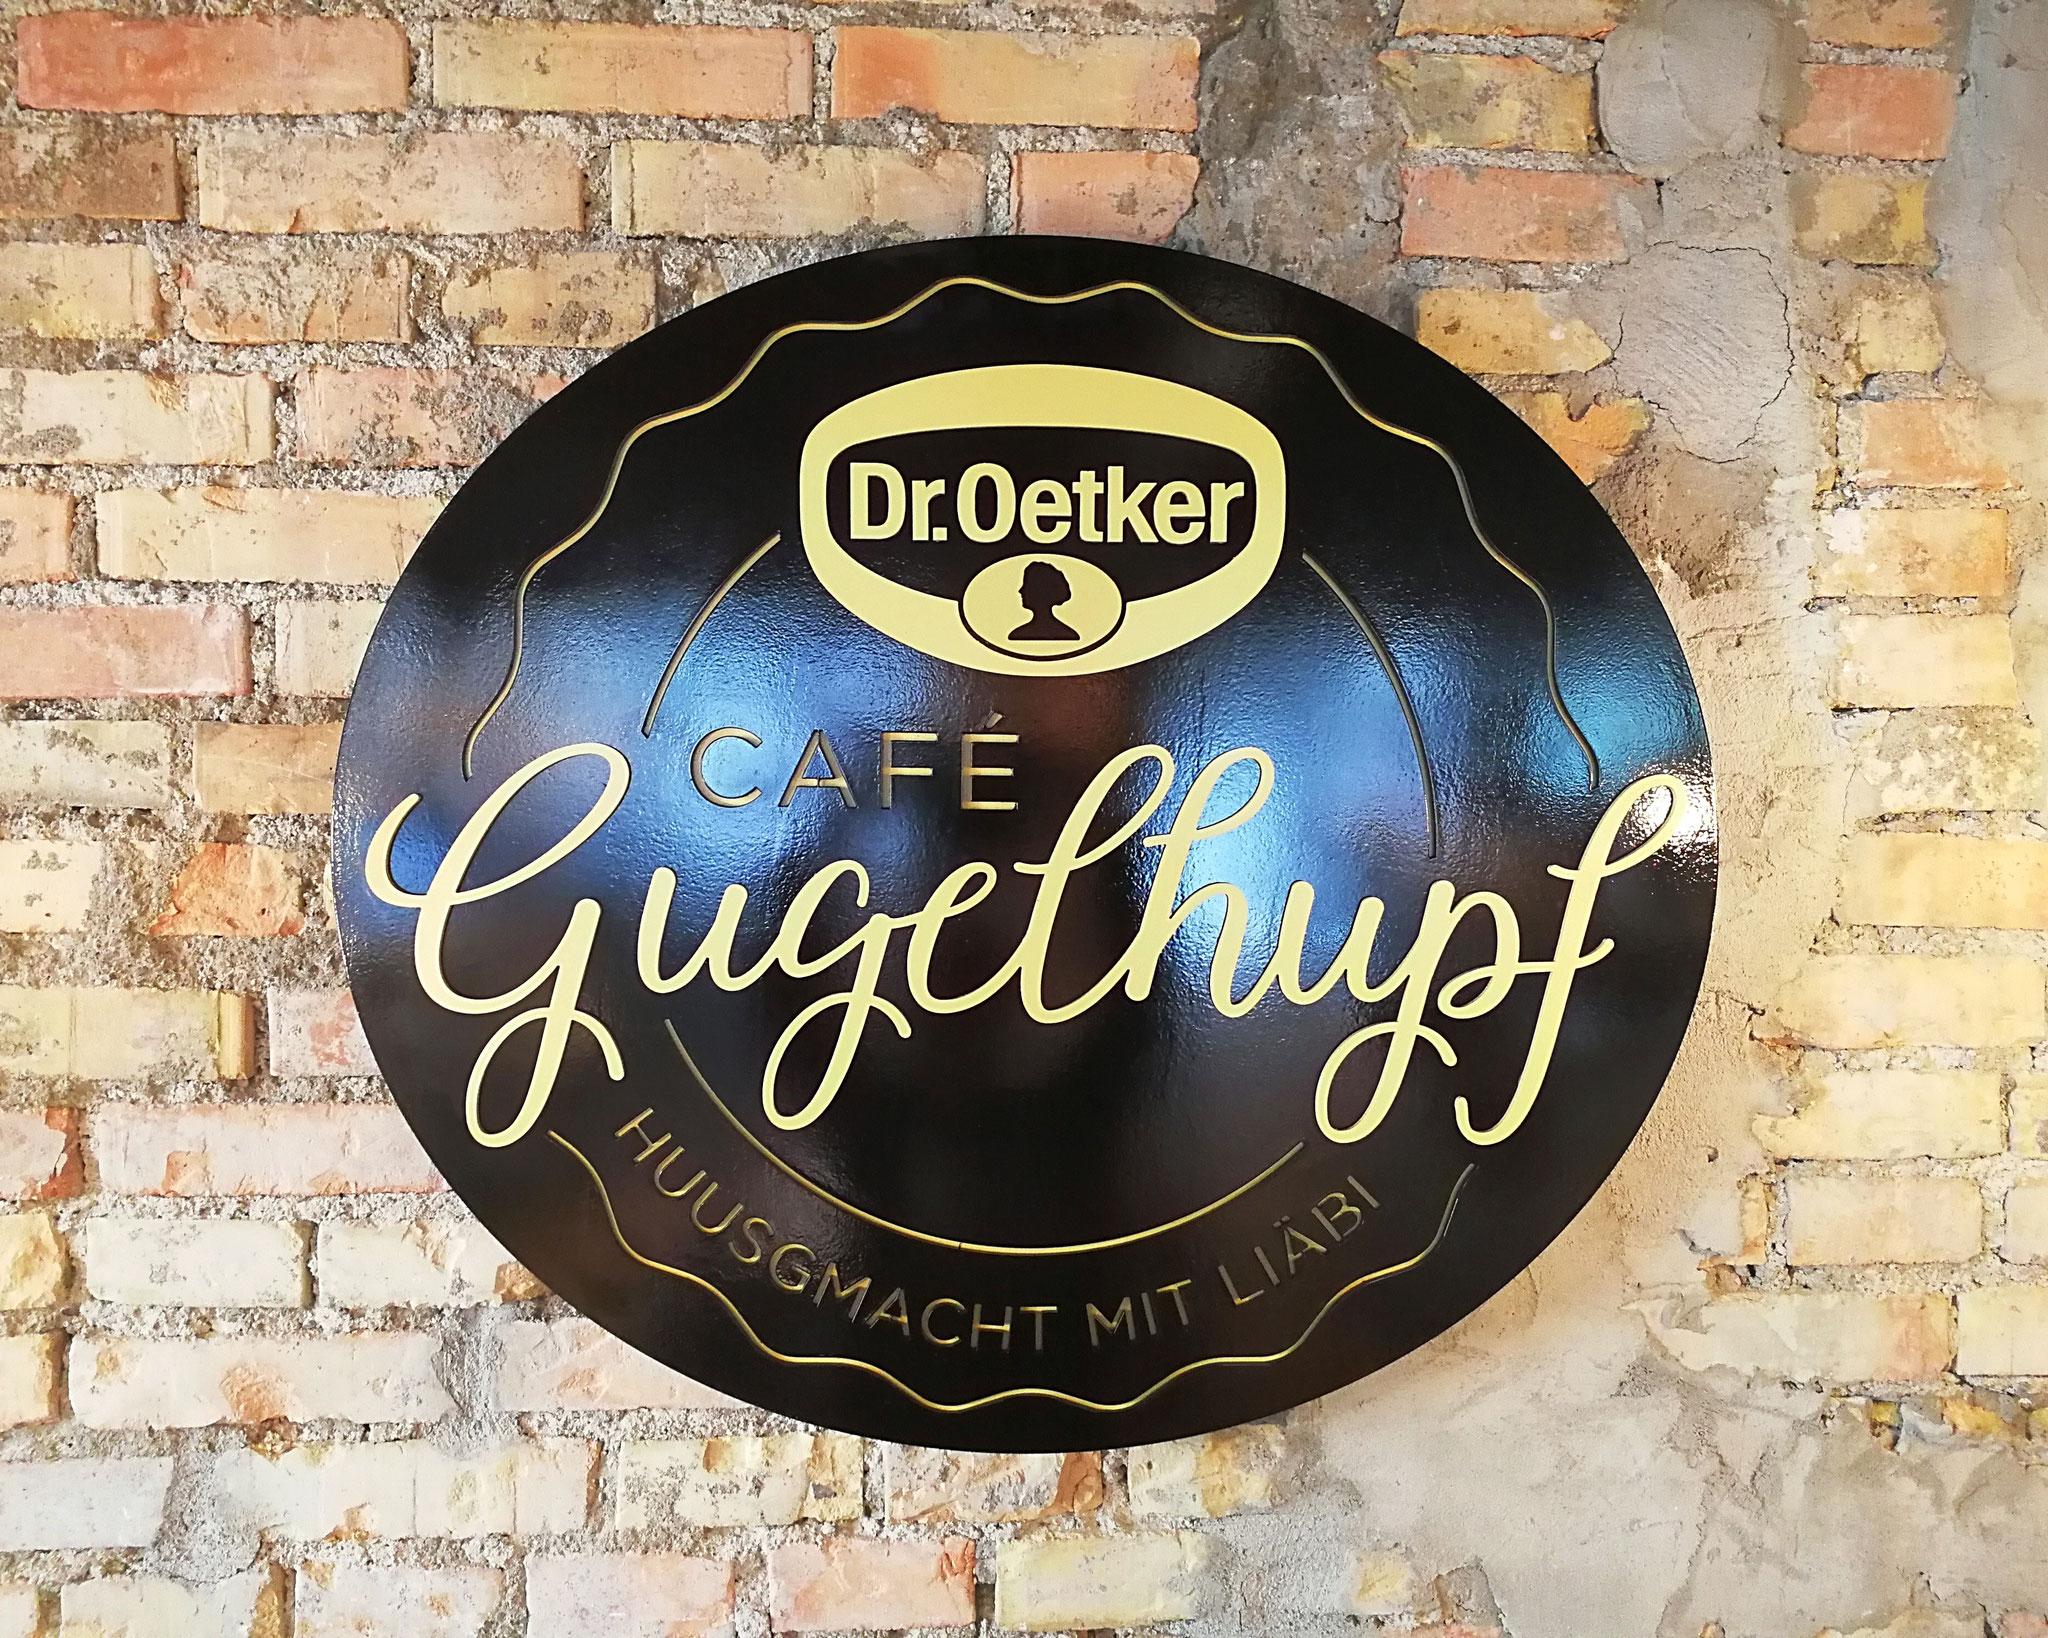 3D Logo Café Gugelhupf in Luzern by BlackStone Werbetechnik GmbH Luzern